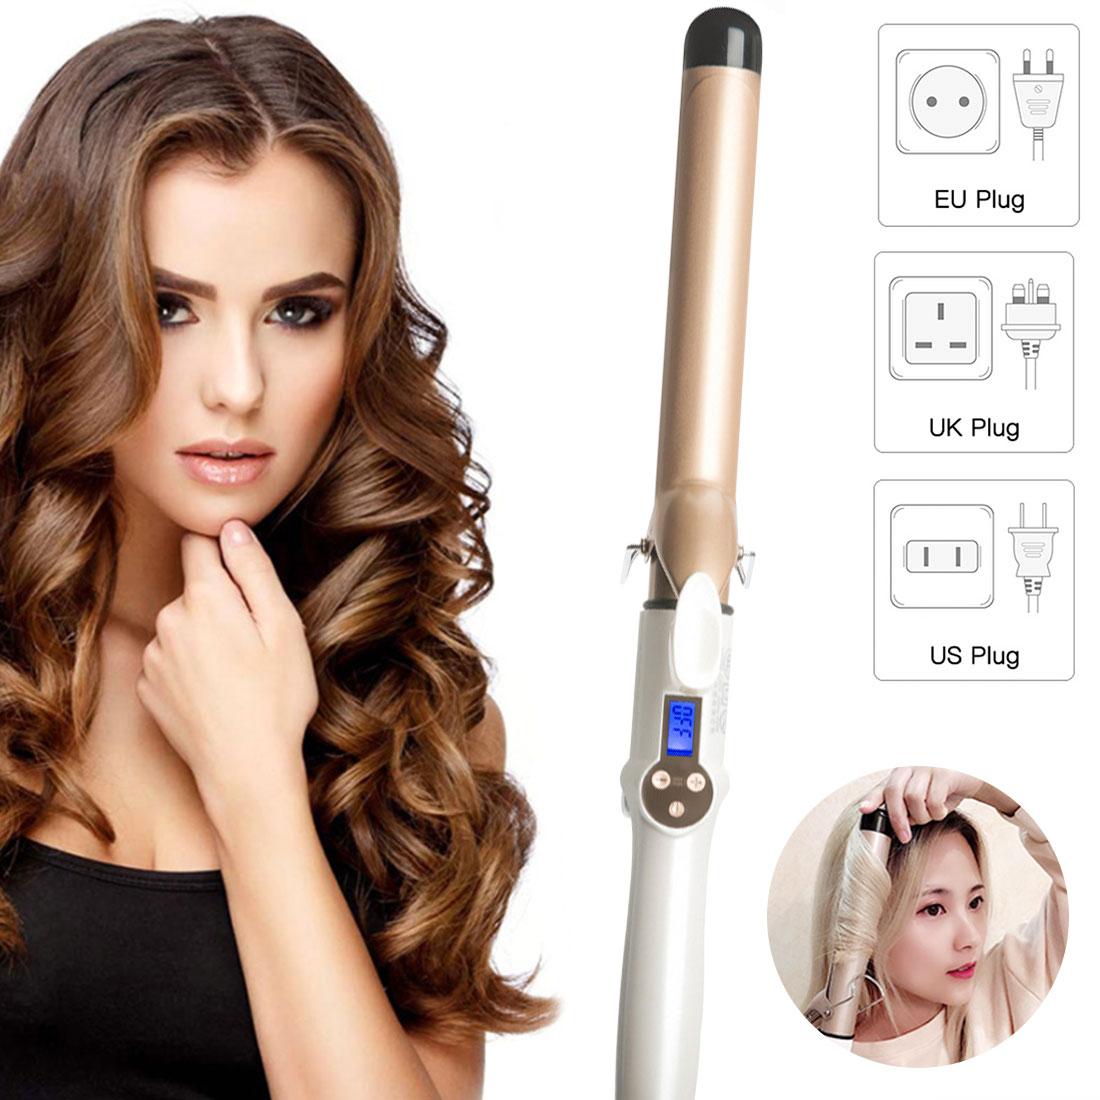 modelador de cabelo eletrico ceramica curling ferro estilo profissional ferro ondulacao